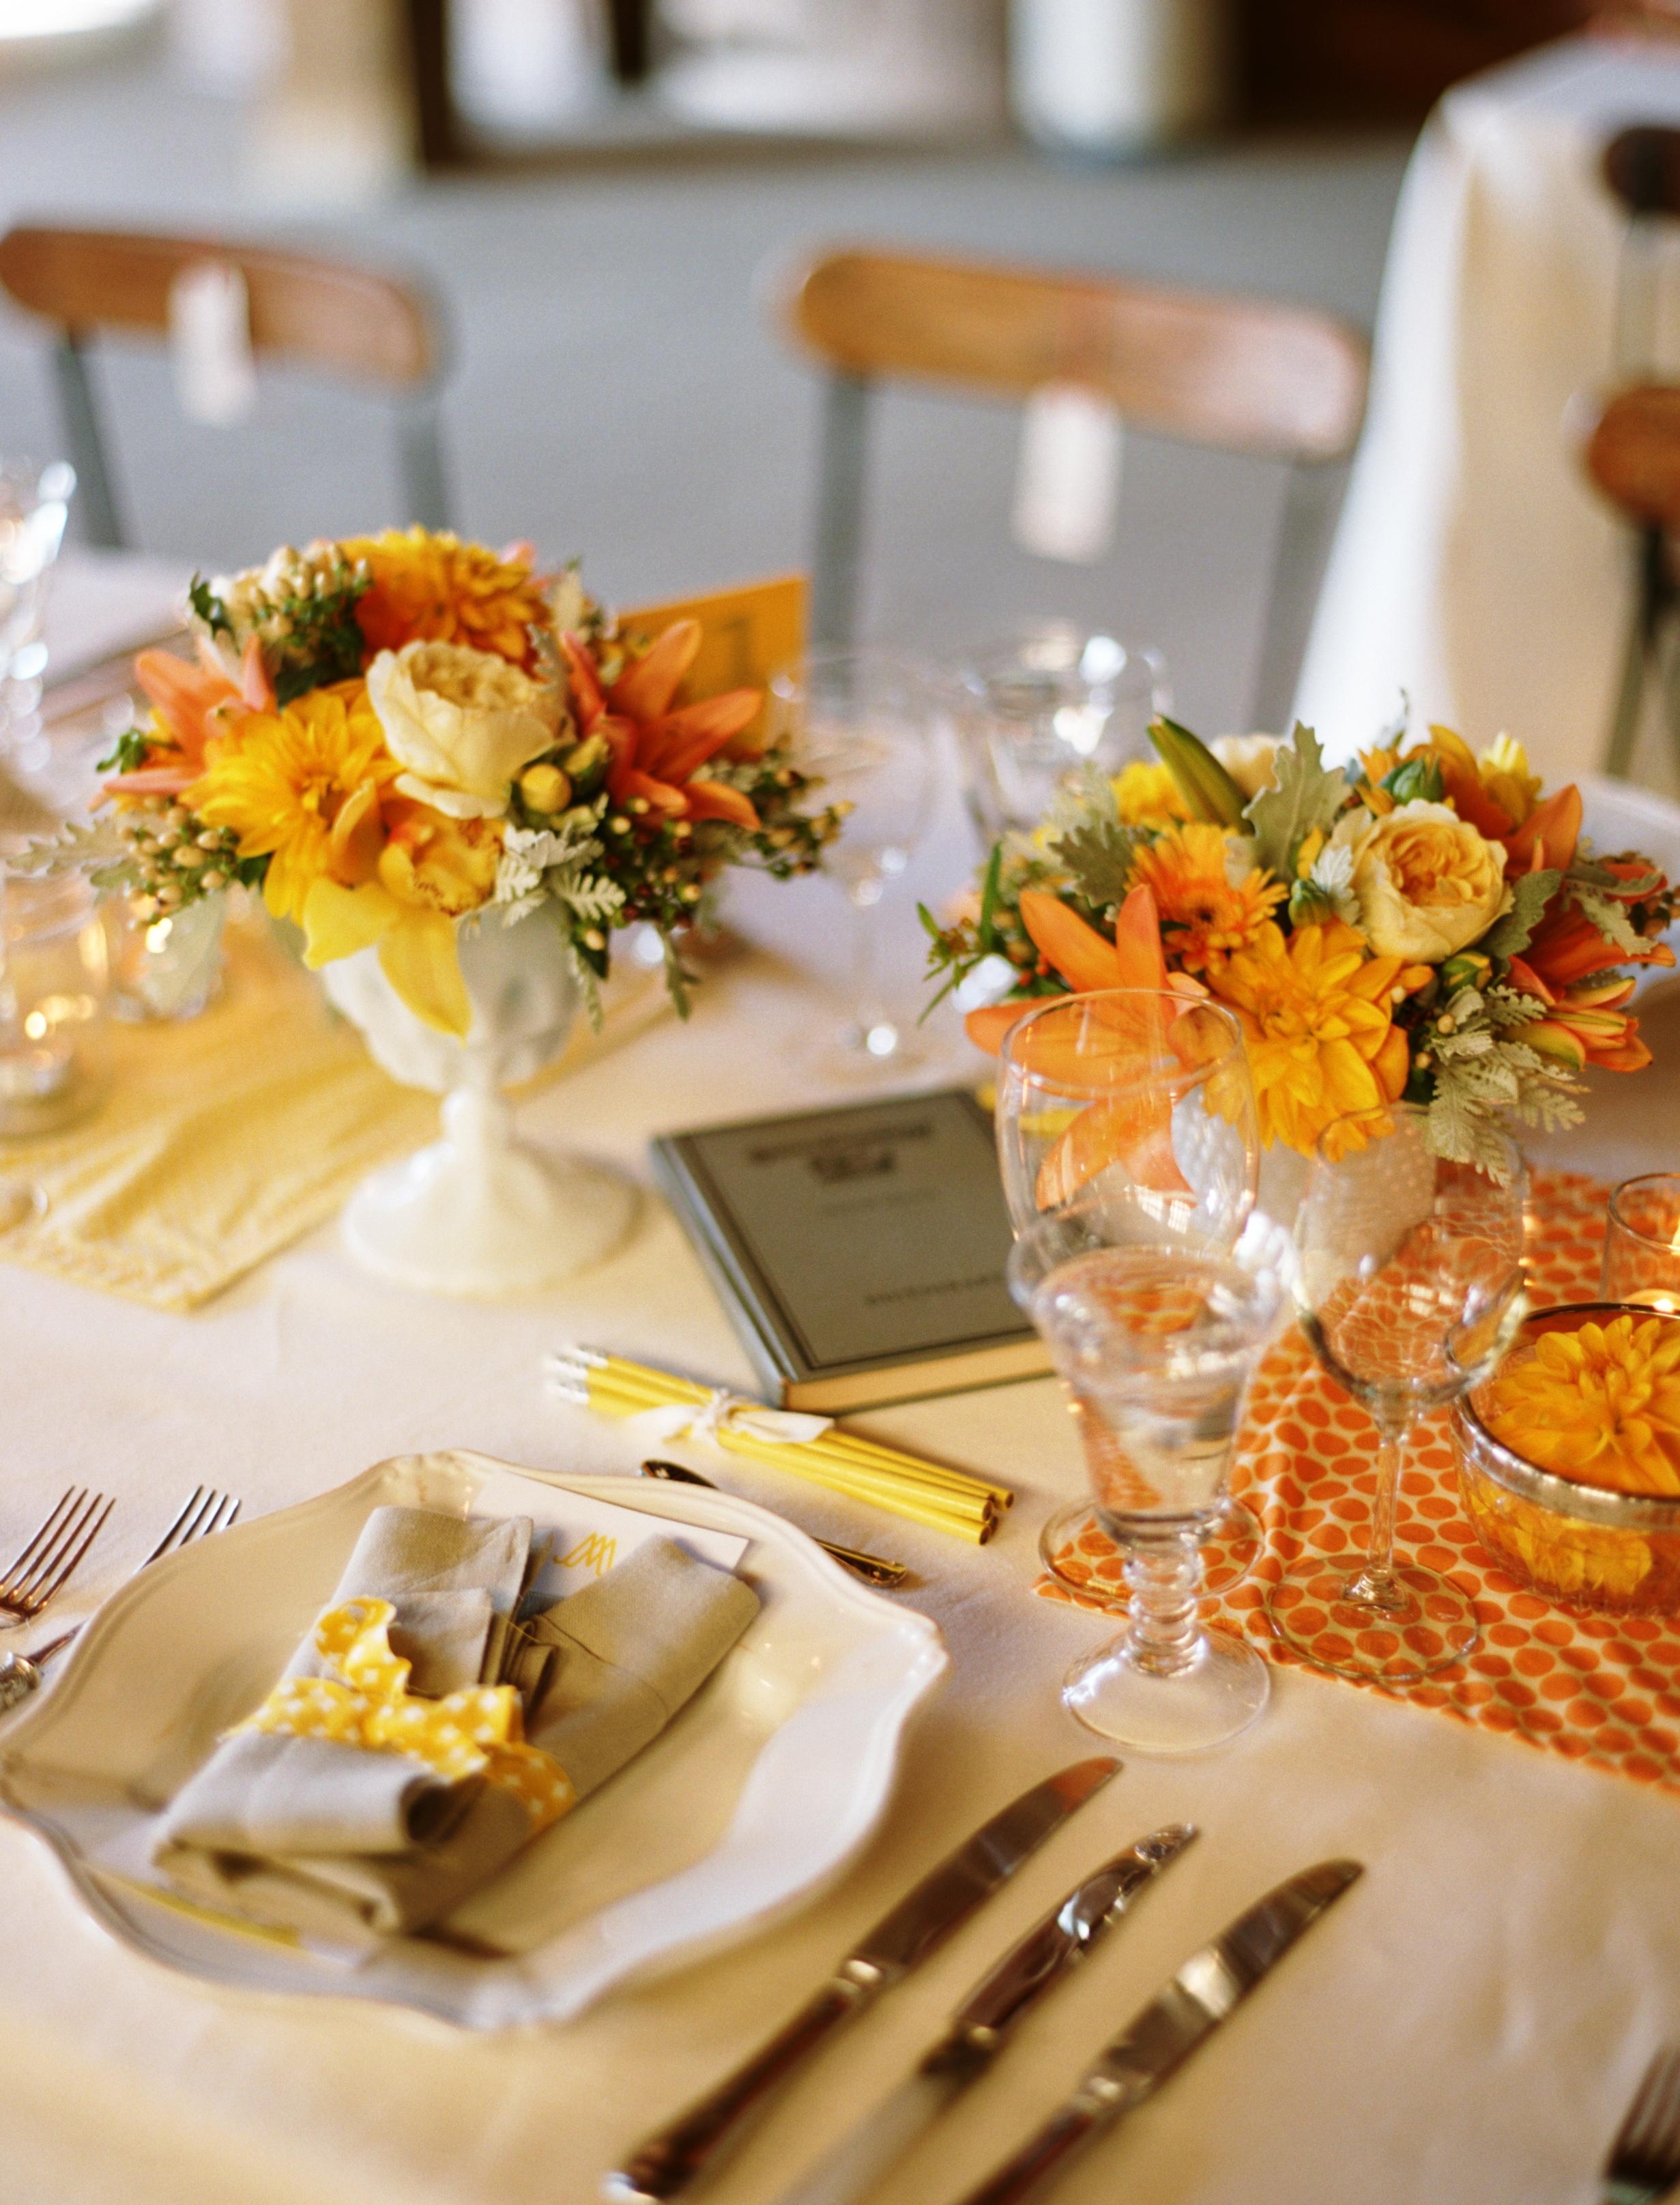 Reception, Flowers & Decor, Decor, yellow, Flowers, Wedding, Farm, Vases